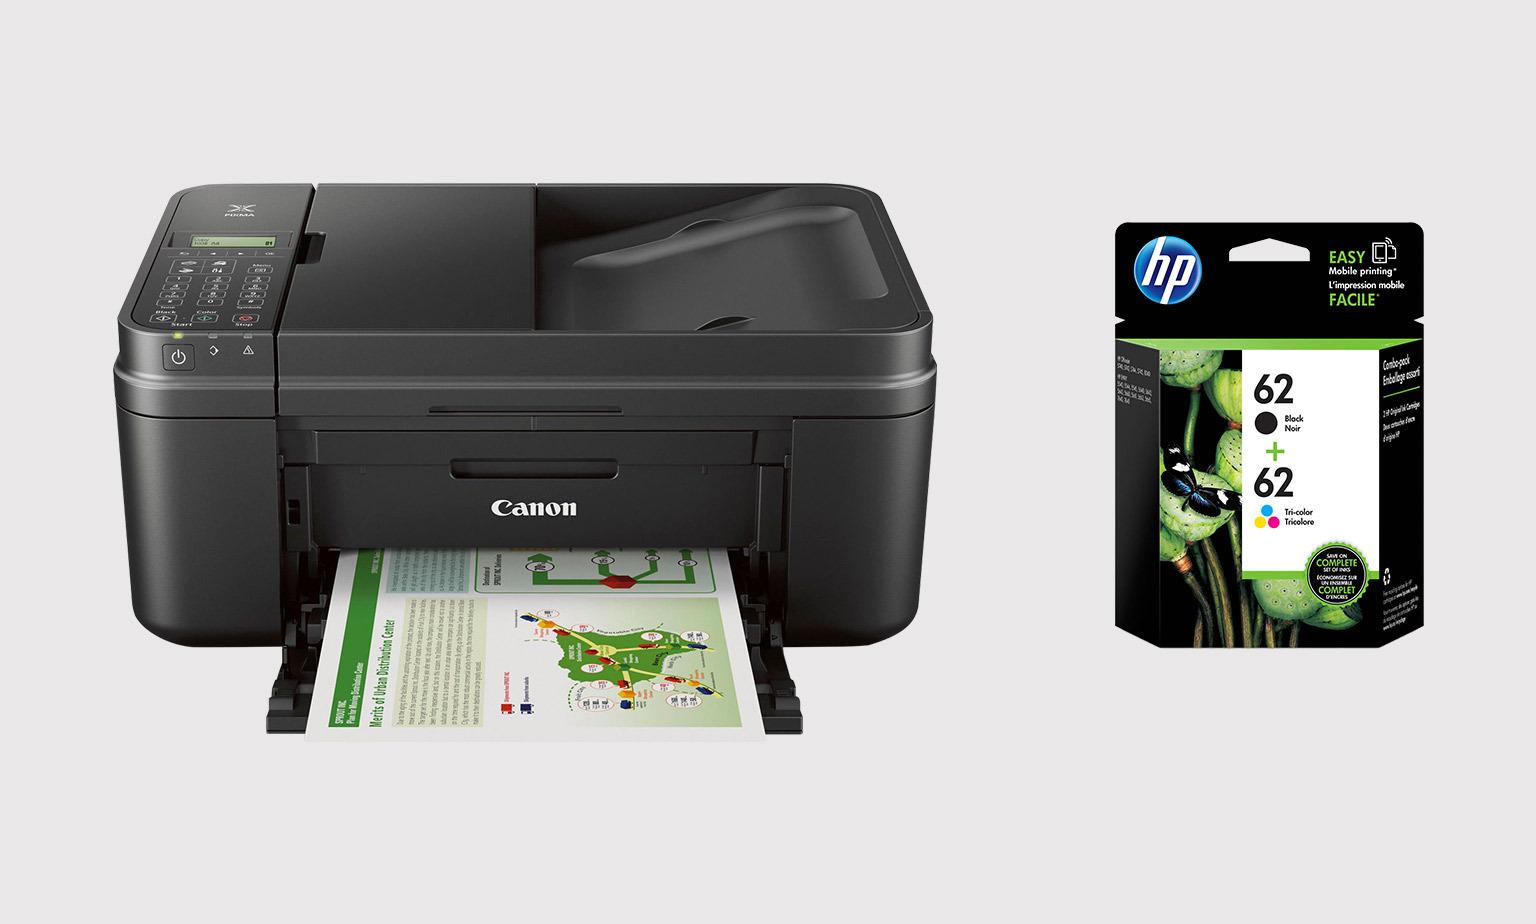 Up to 40% Off Printer & Ink Essentials